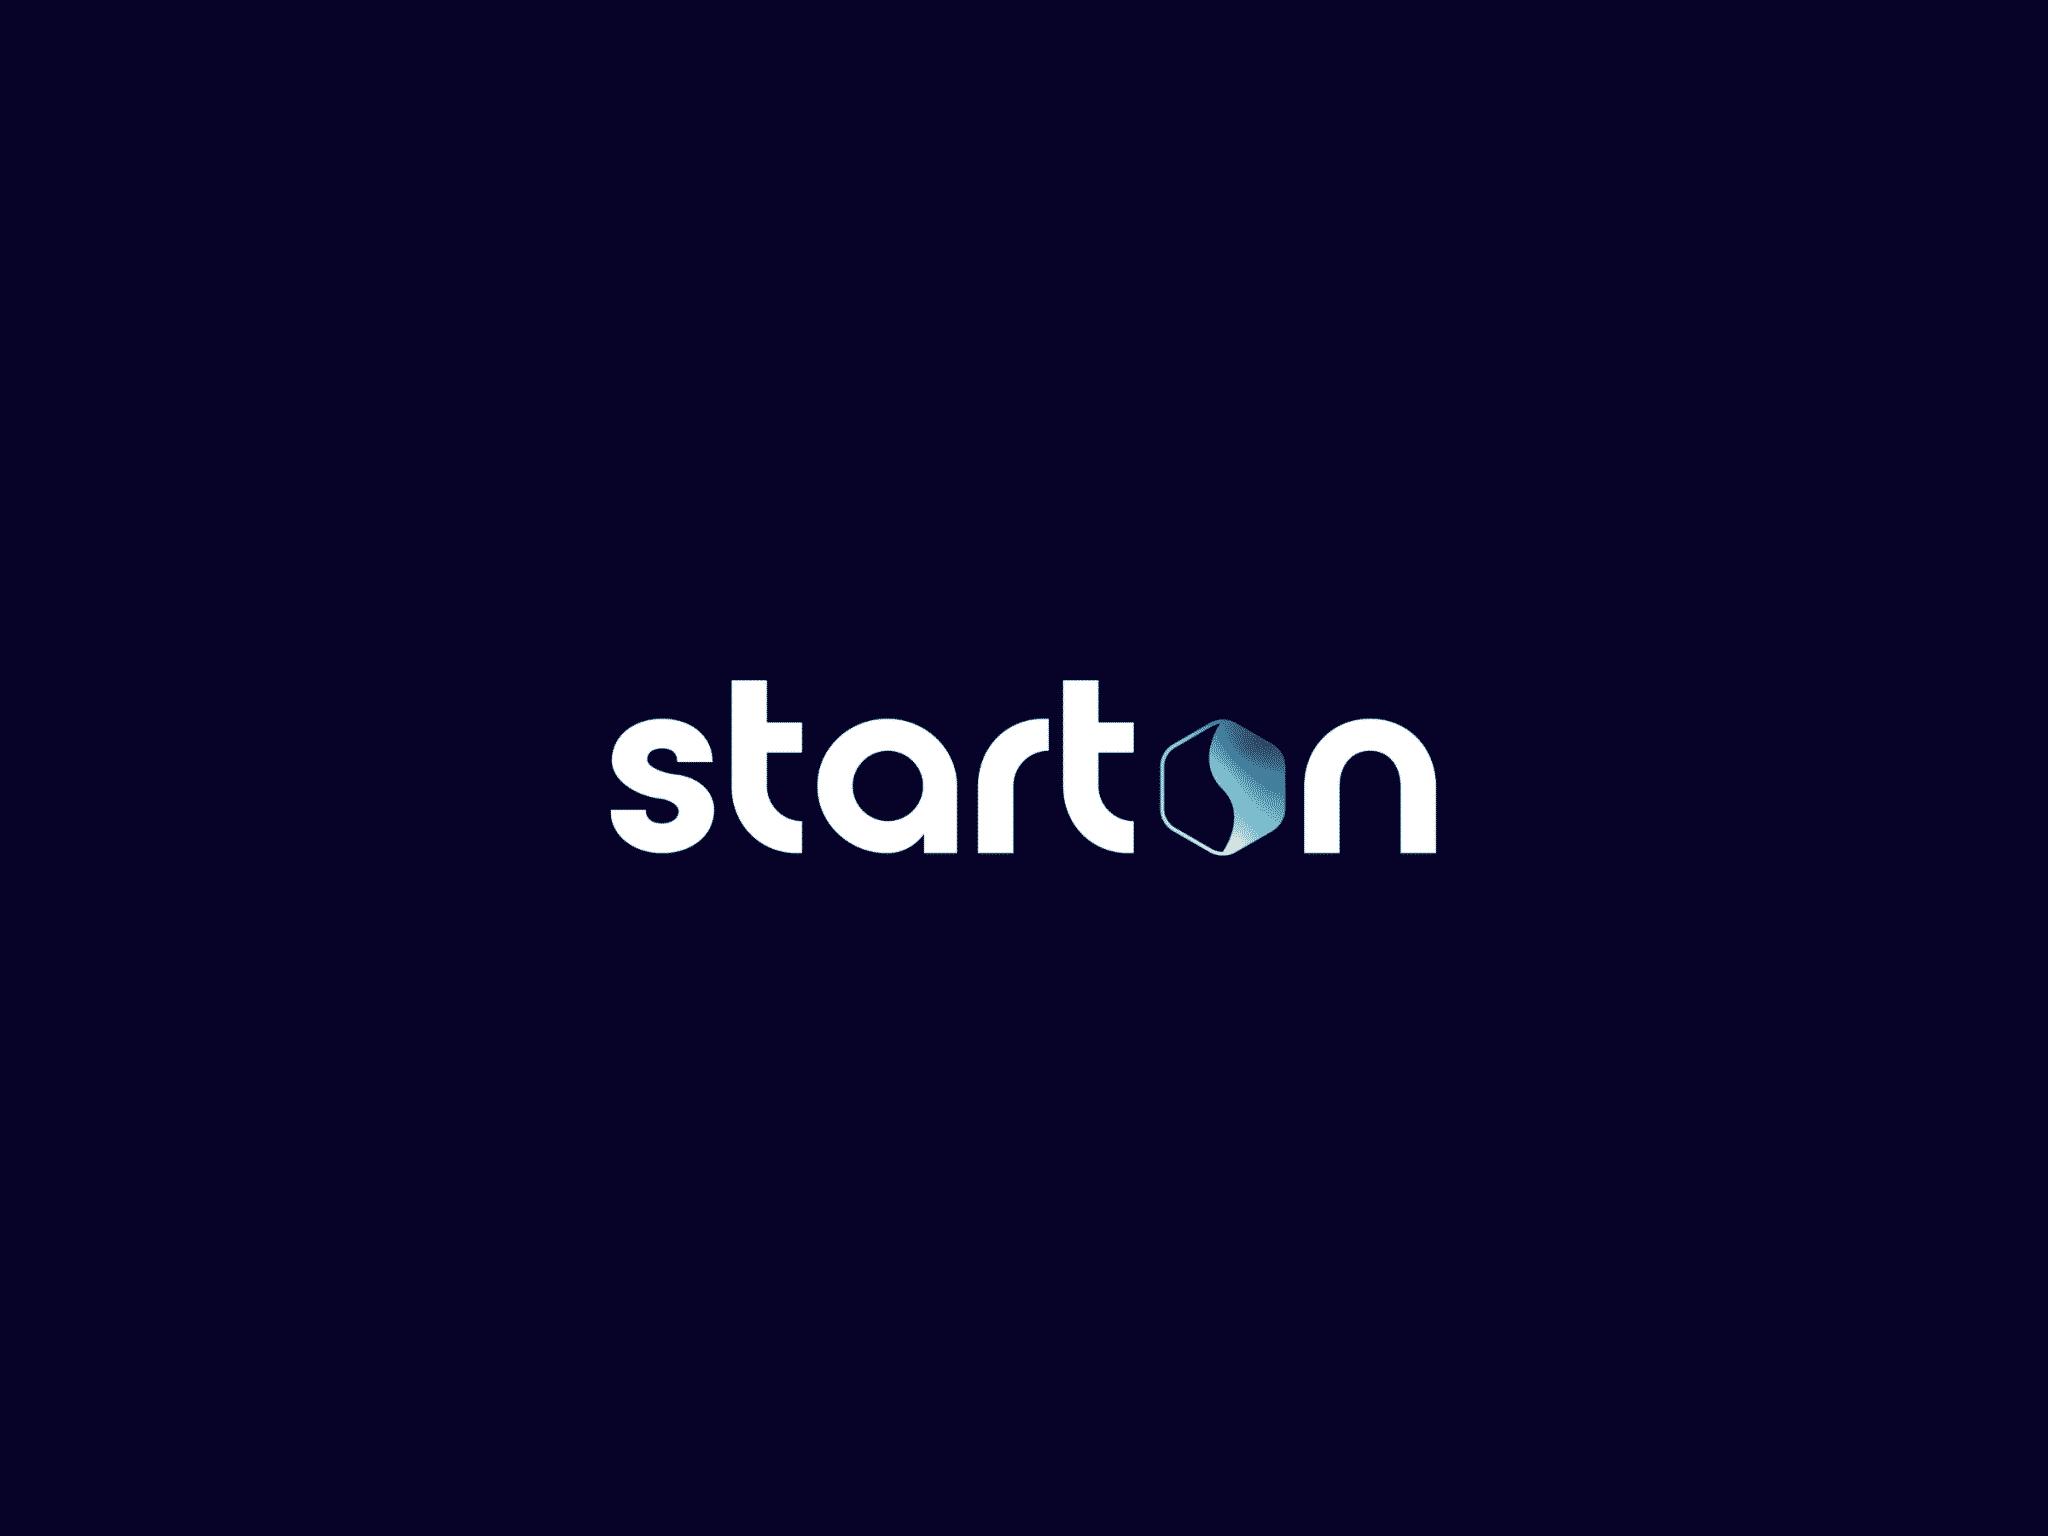 Starton.io